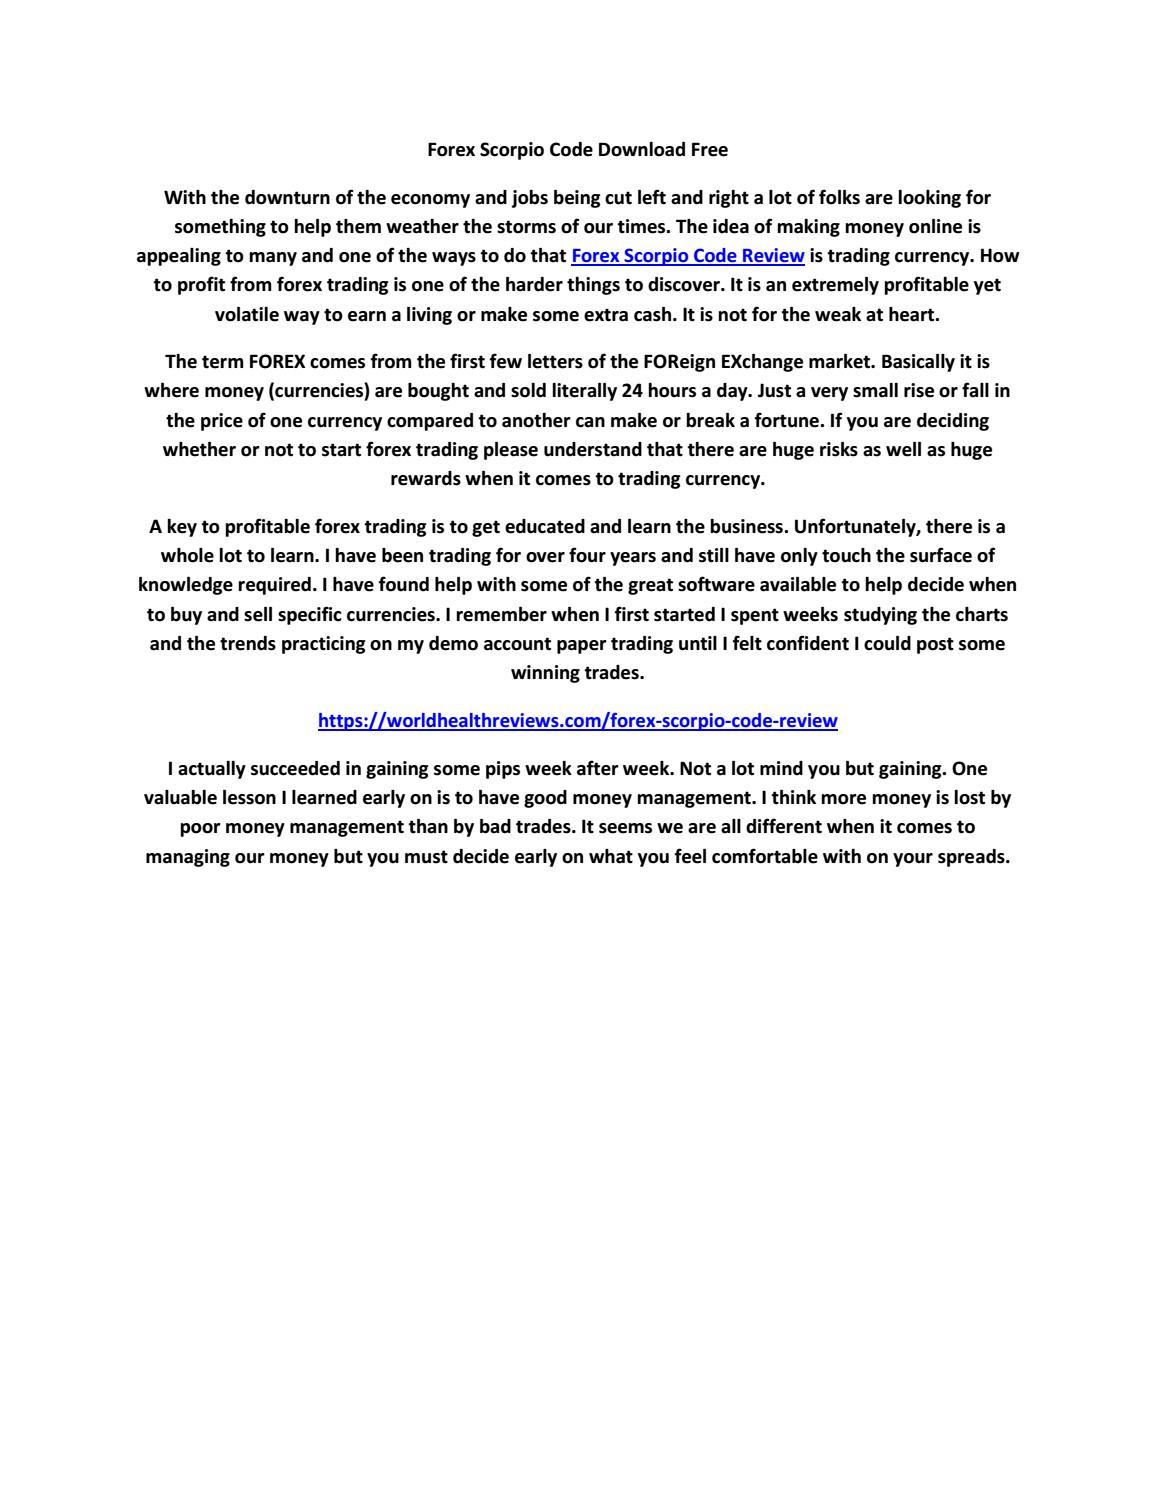 Forex scorpio code free download